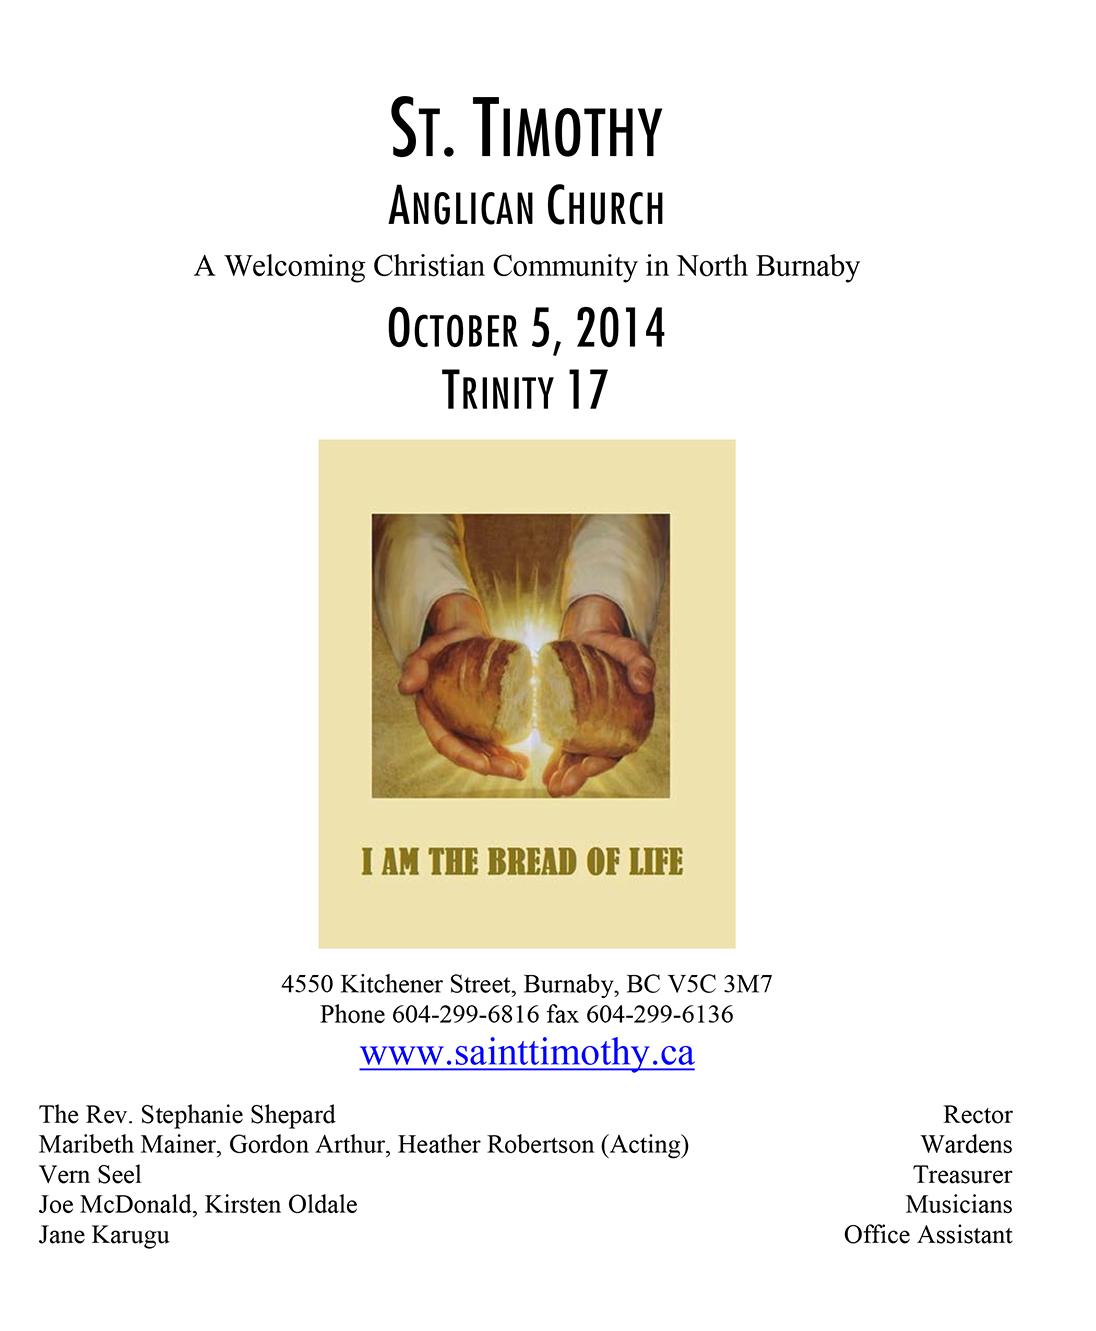 Bulletin: October 5, 2014